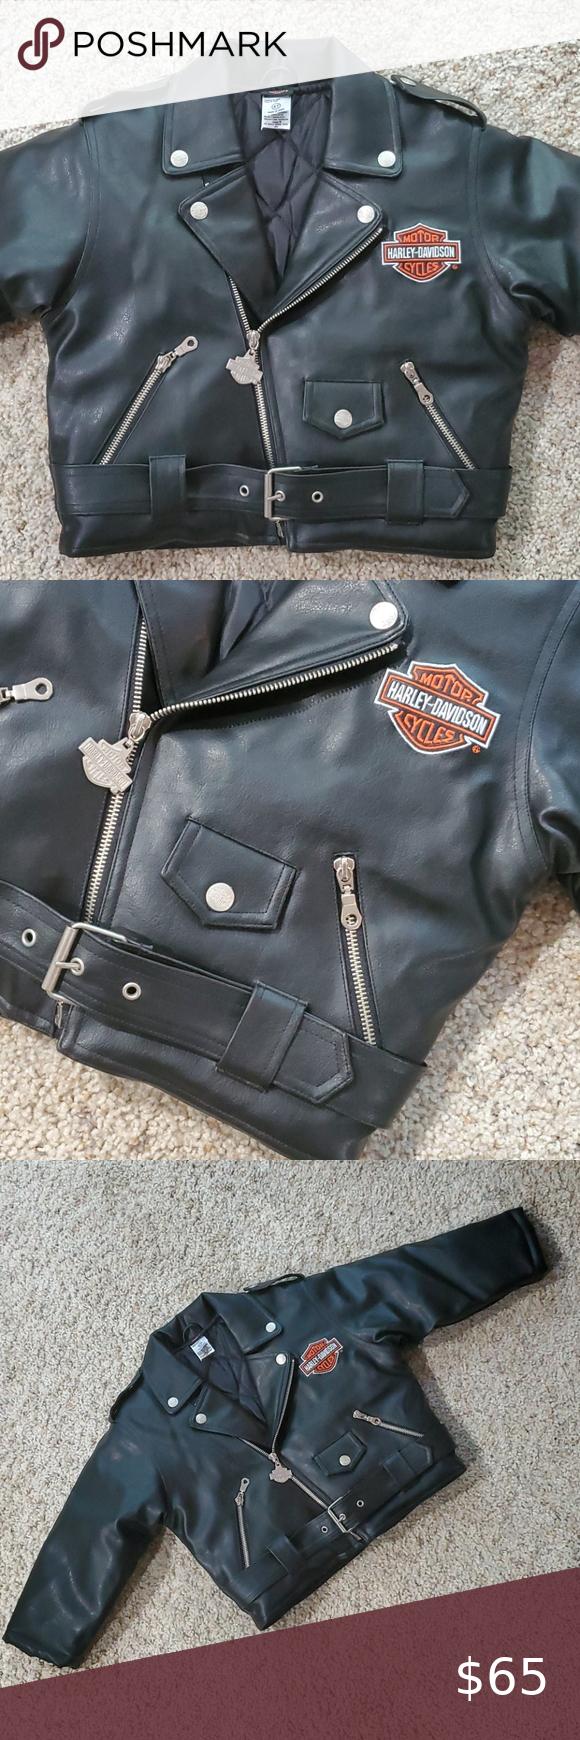 Harley Davidson Toddler Pleather Moto Jacket Harley Davidson Jacket Pleather Moto Jacket [ 1740 x 580 Pixel ]